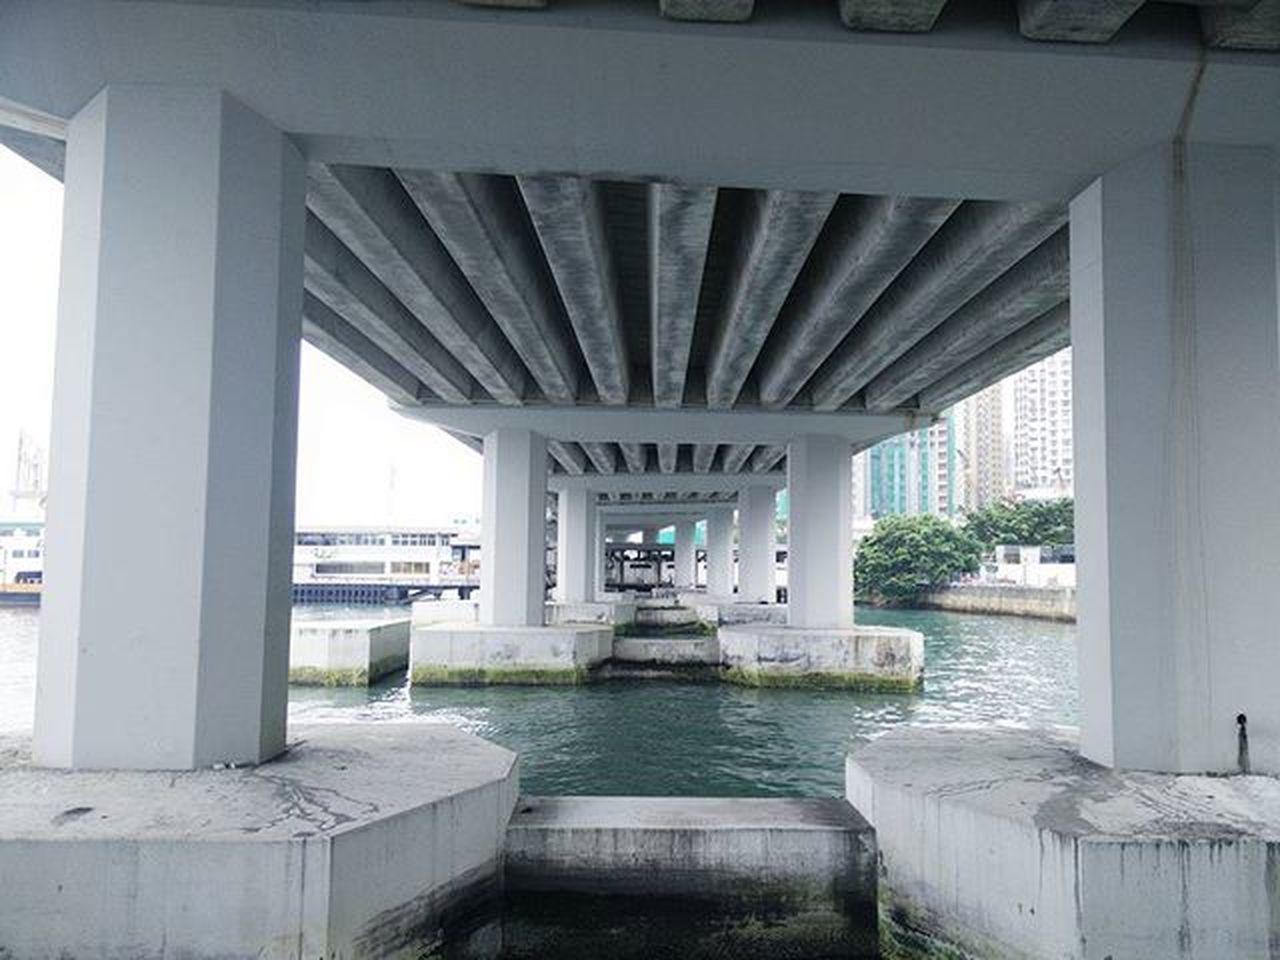 🛣🚝 Underthebridge Underpass Northpoint Instameethk Hkig EyeEm Oneplusone Photography Art The Architect - 2016 EyeEm Awards